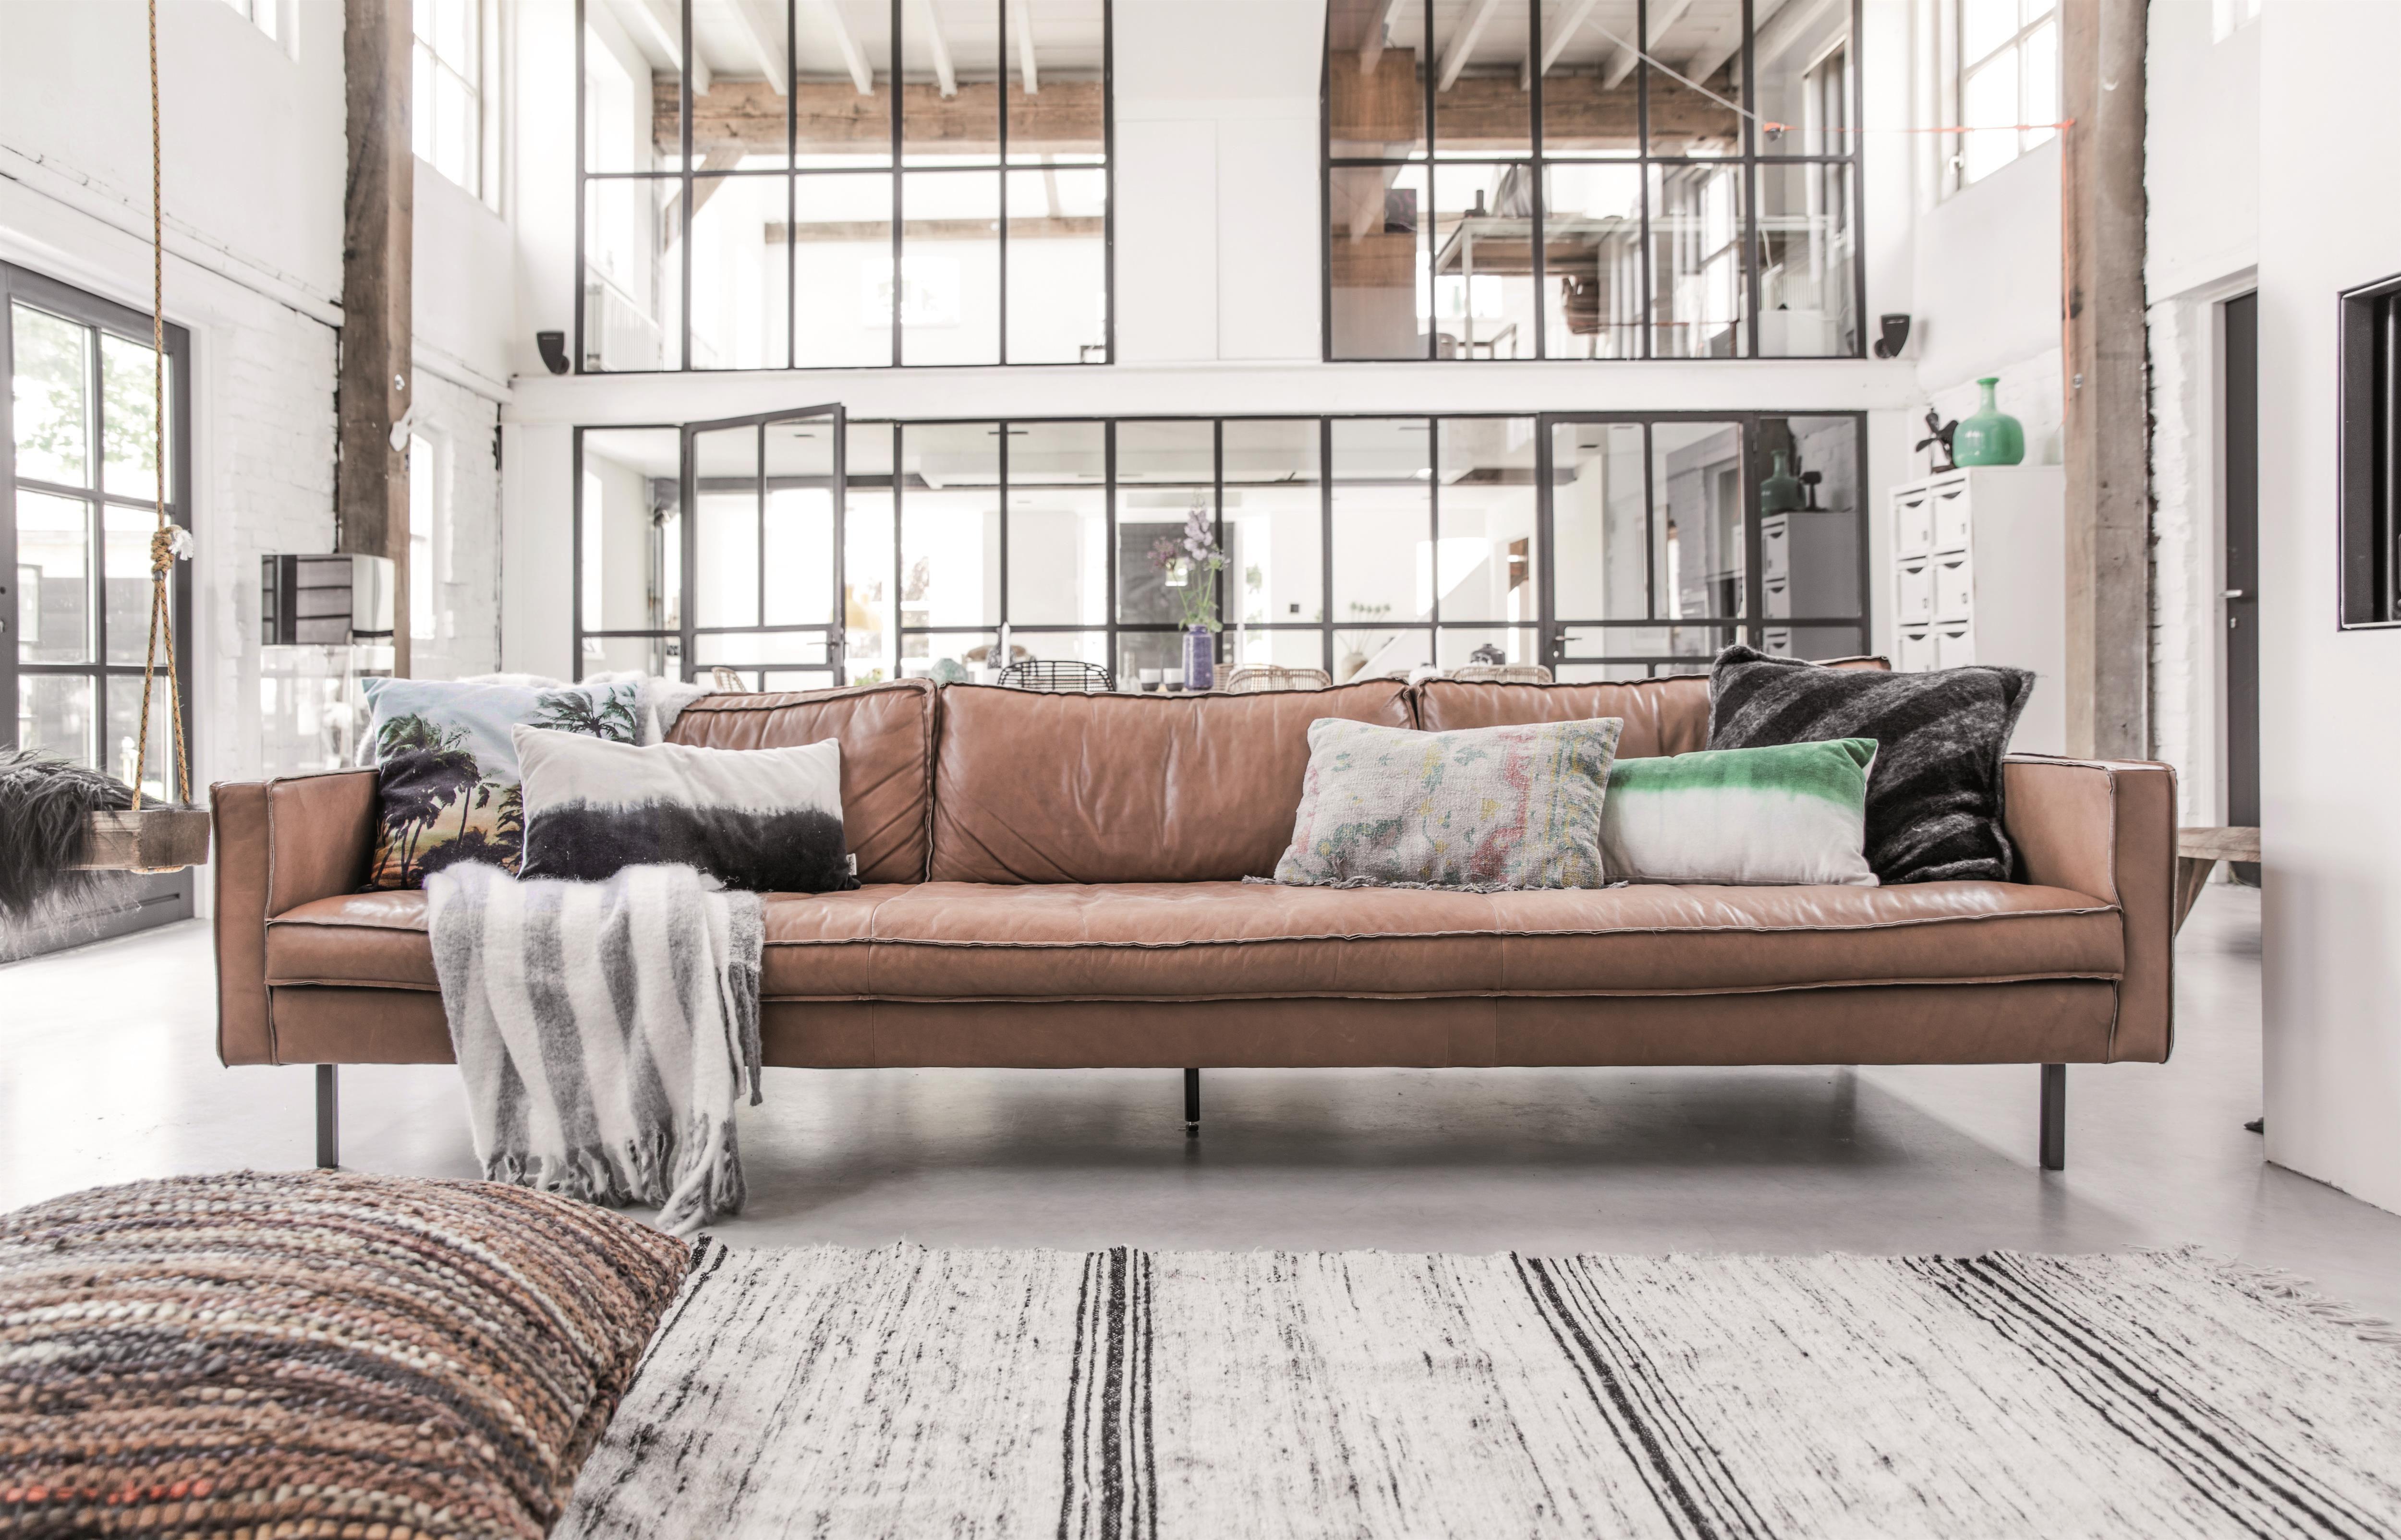 Fleur je hele woonkamer op met de eigentijdse en trendy kussens